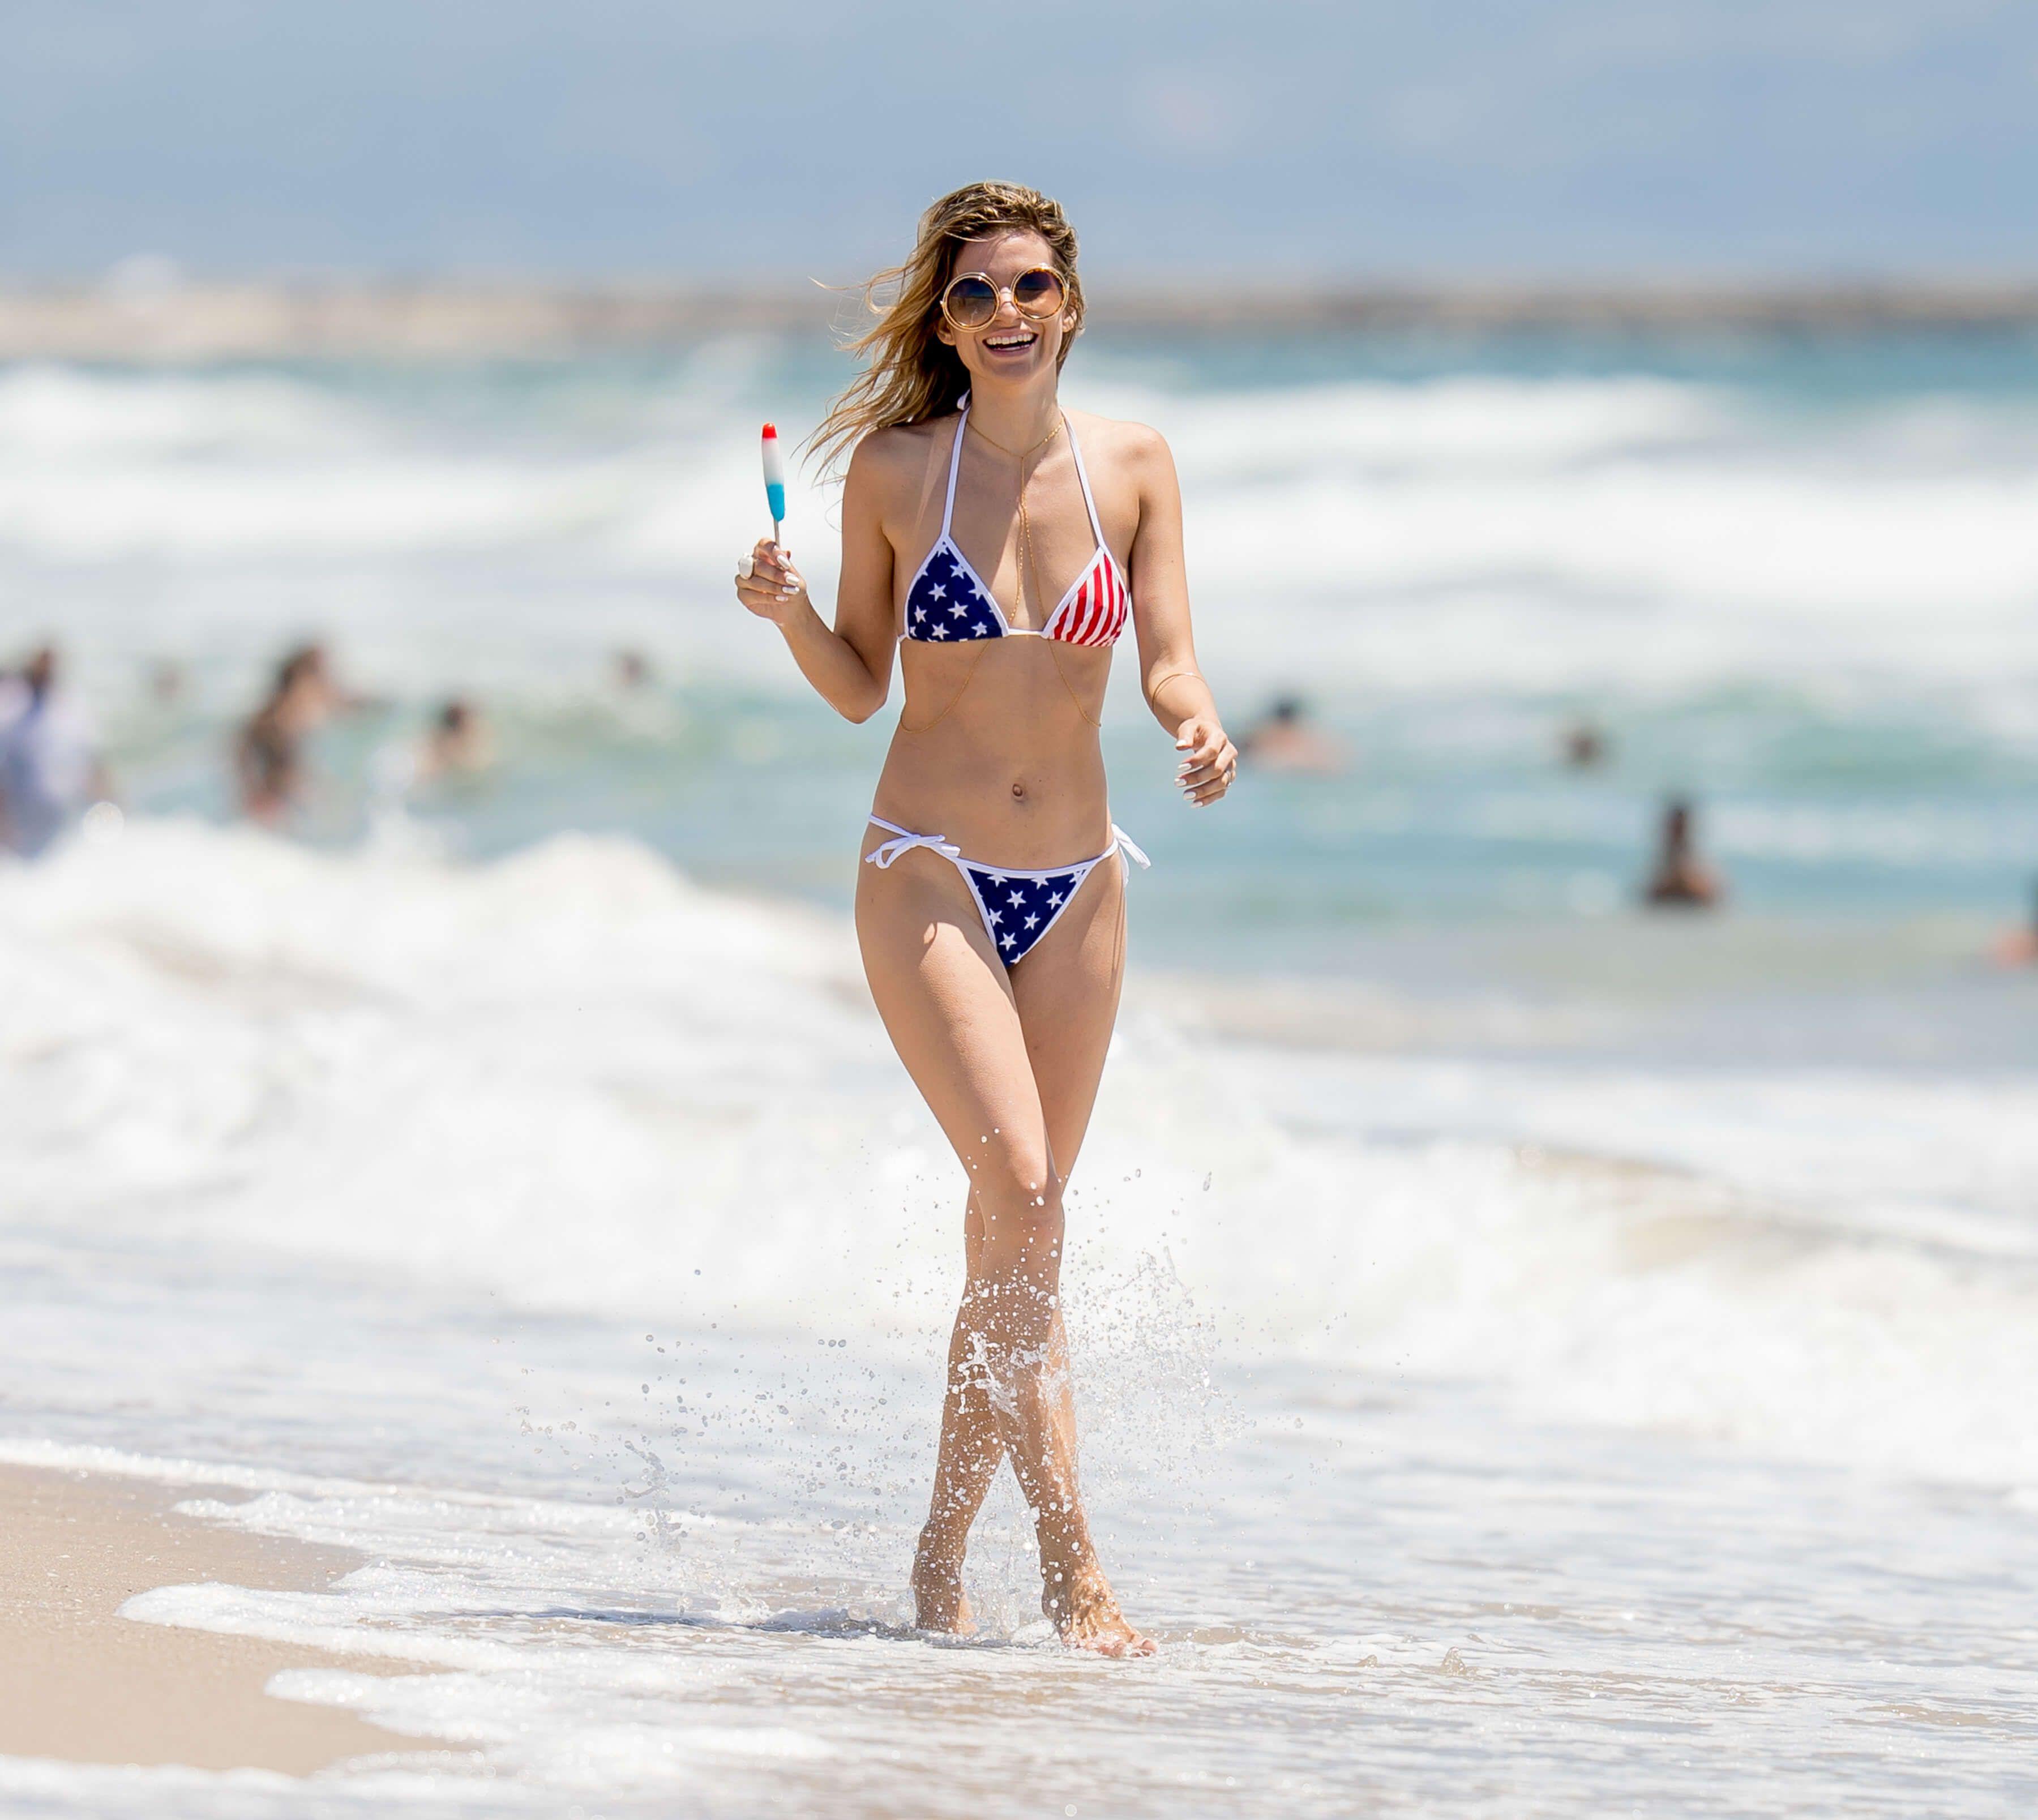 Rachel McCord Bikini Candids in Venice Beach - http://www.celezz.com/2016/07/rachel-mccord-bikini-candids-venice-beach/ - Bikini, Rachel McCord